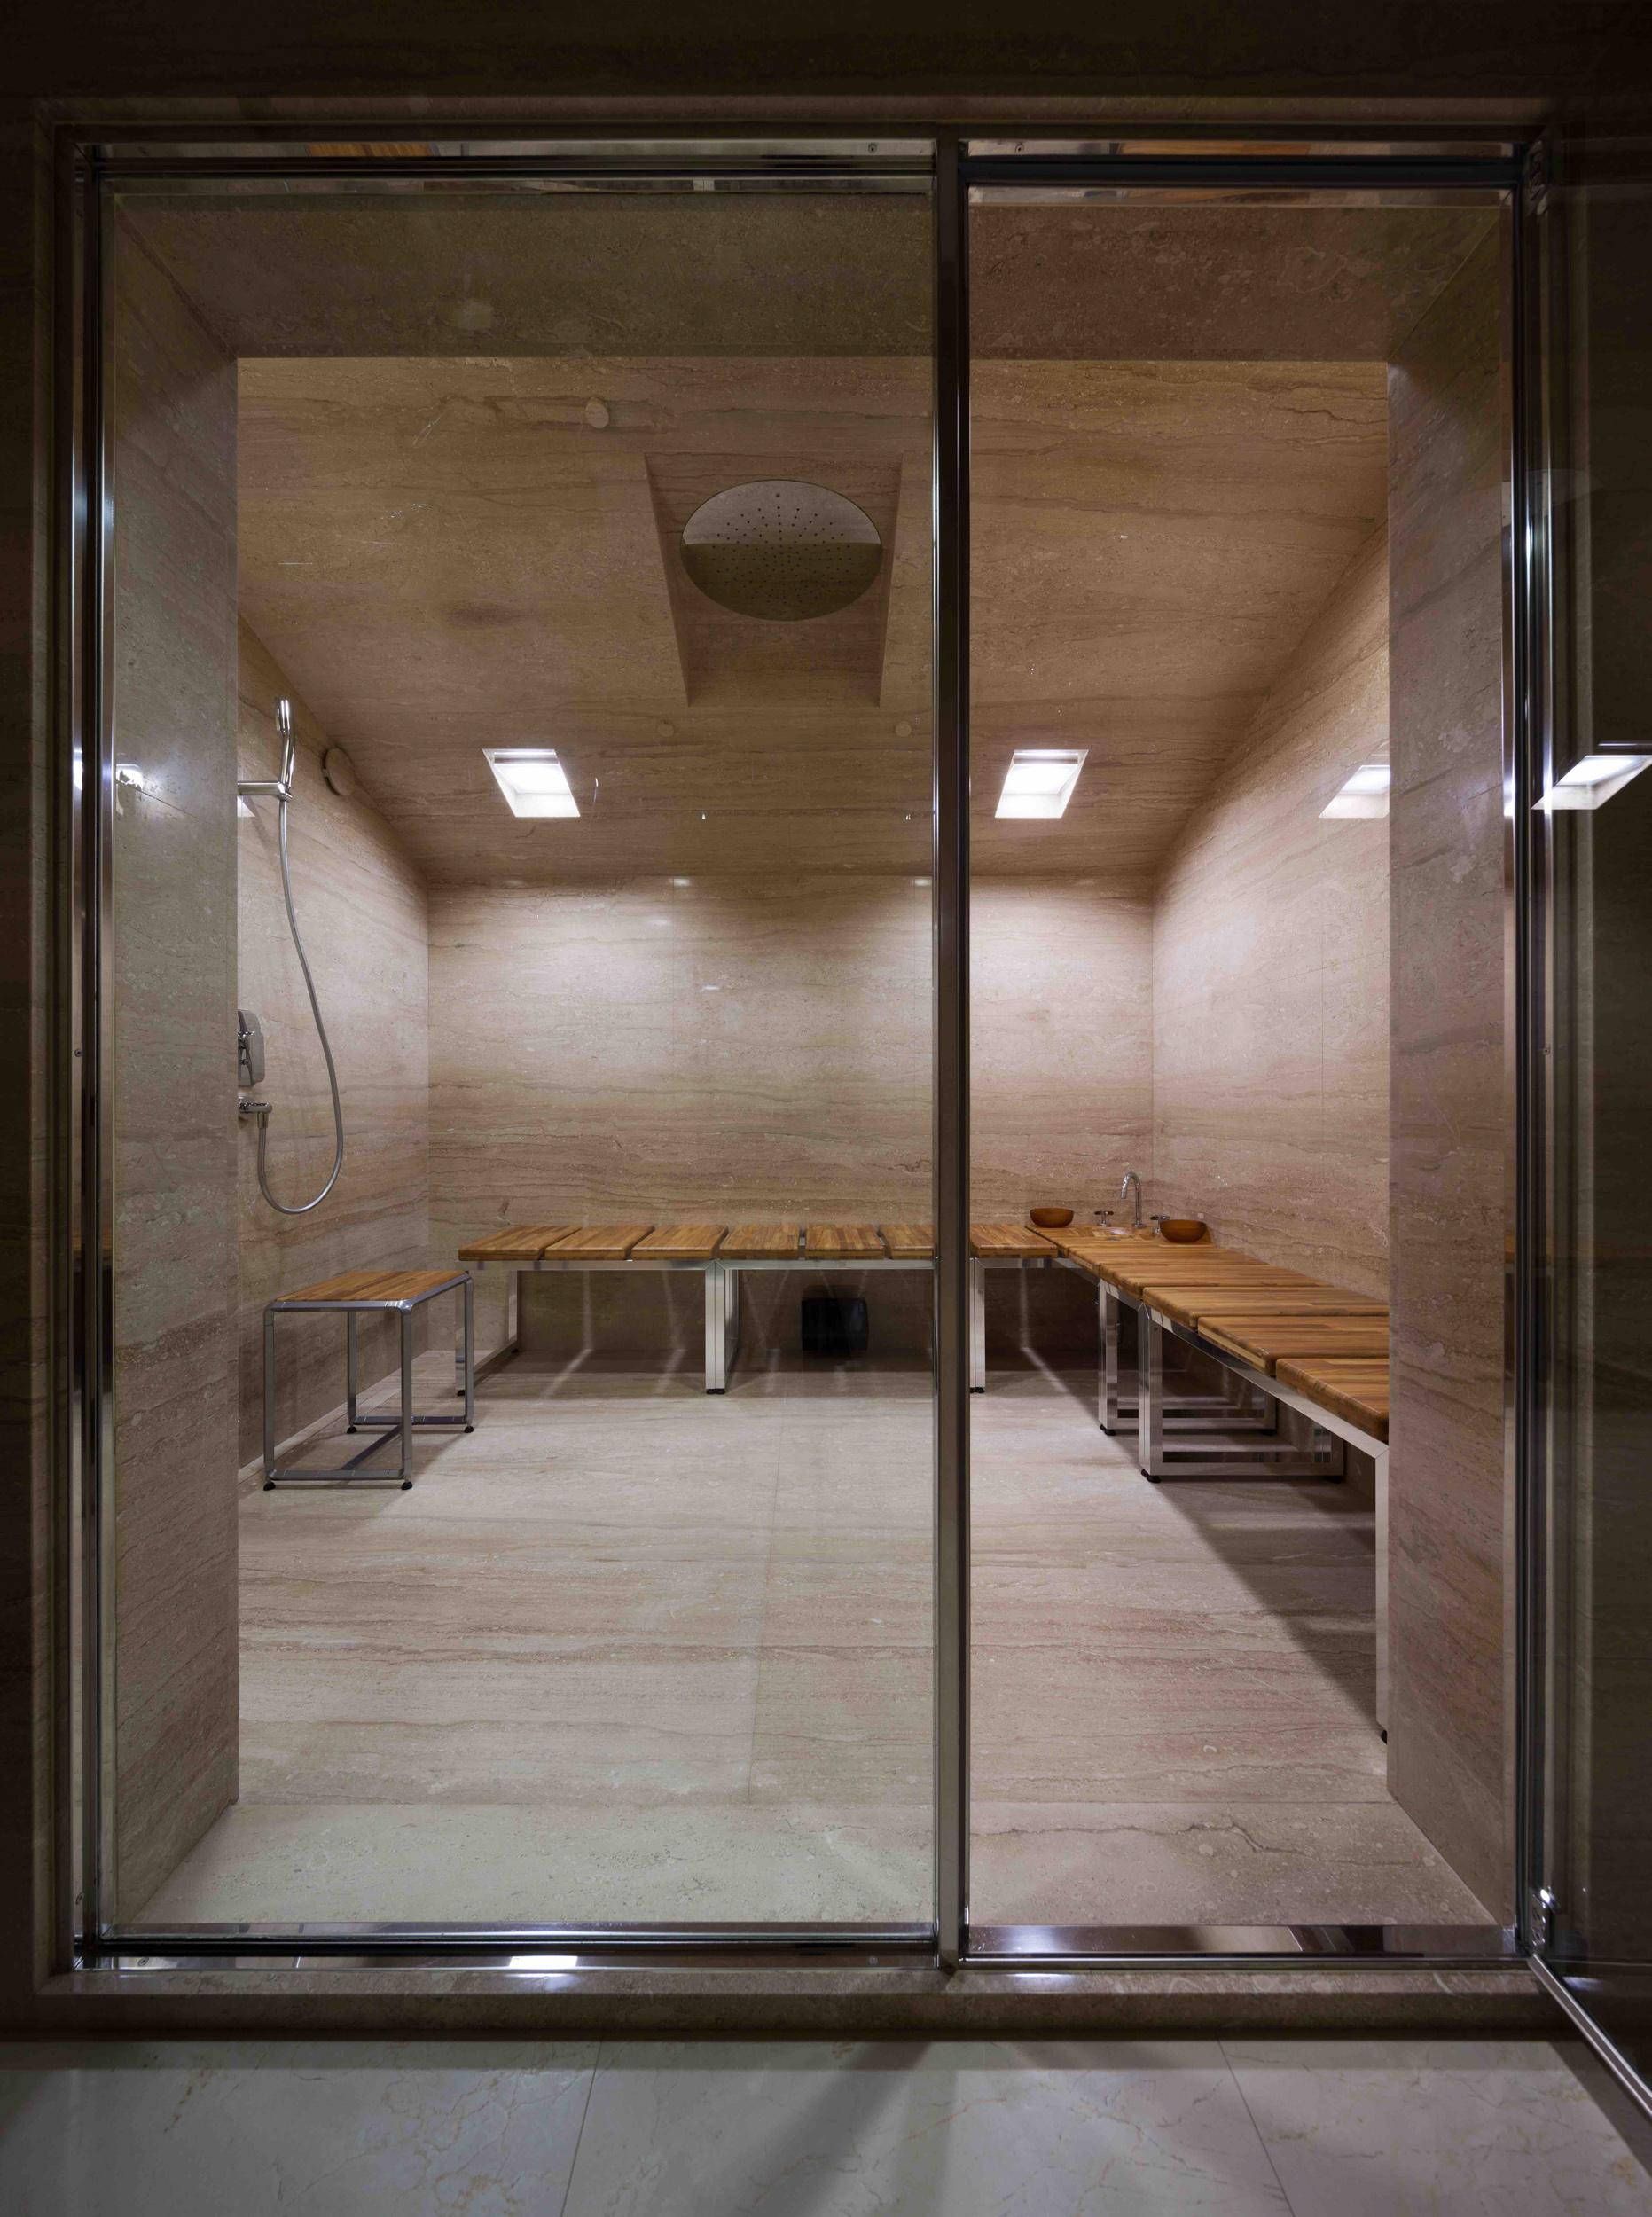 Individually designed hammam. Marble base and wooden elements. Мраморный хаммам по индивидуальному проекту с деревянными элементами.